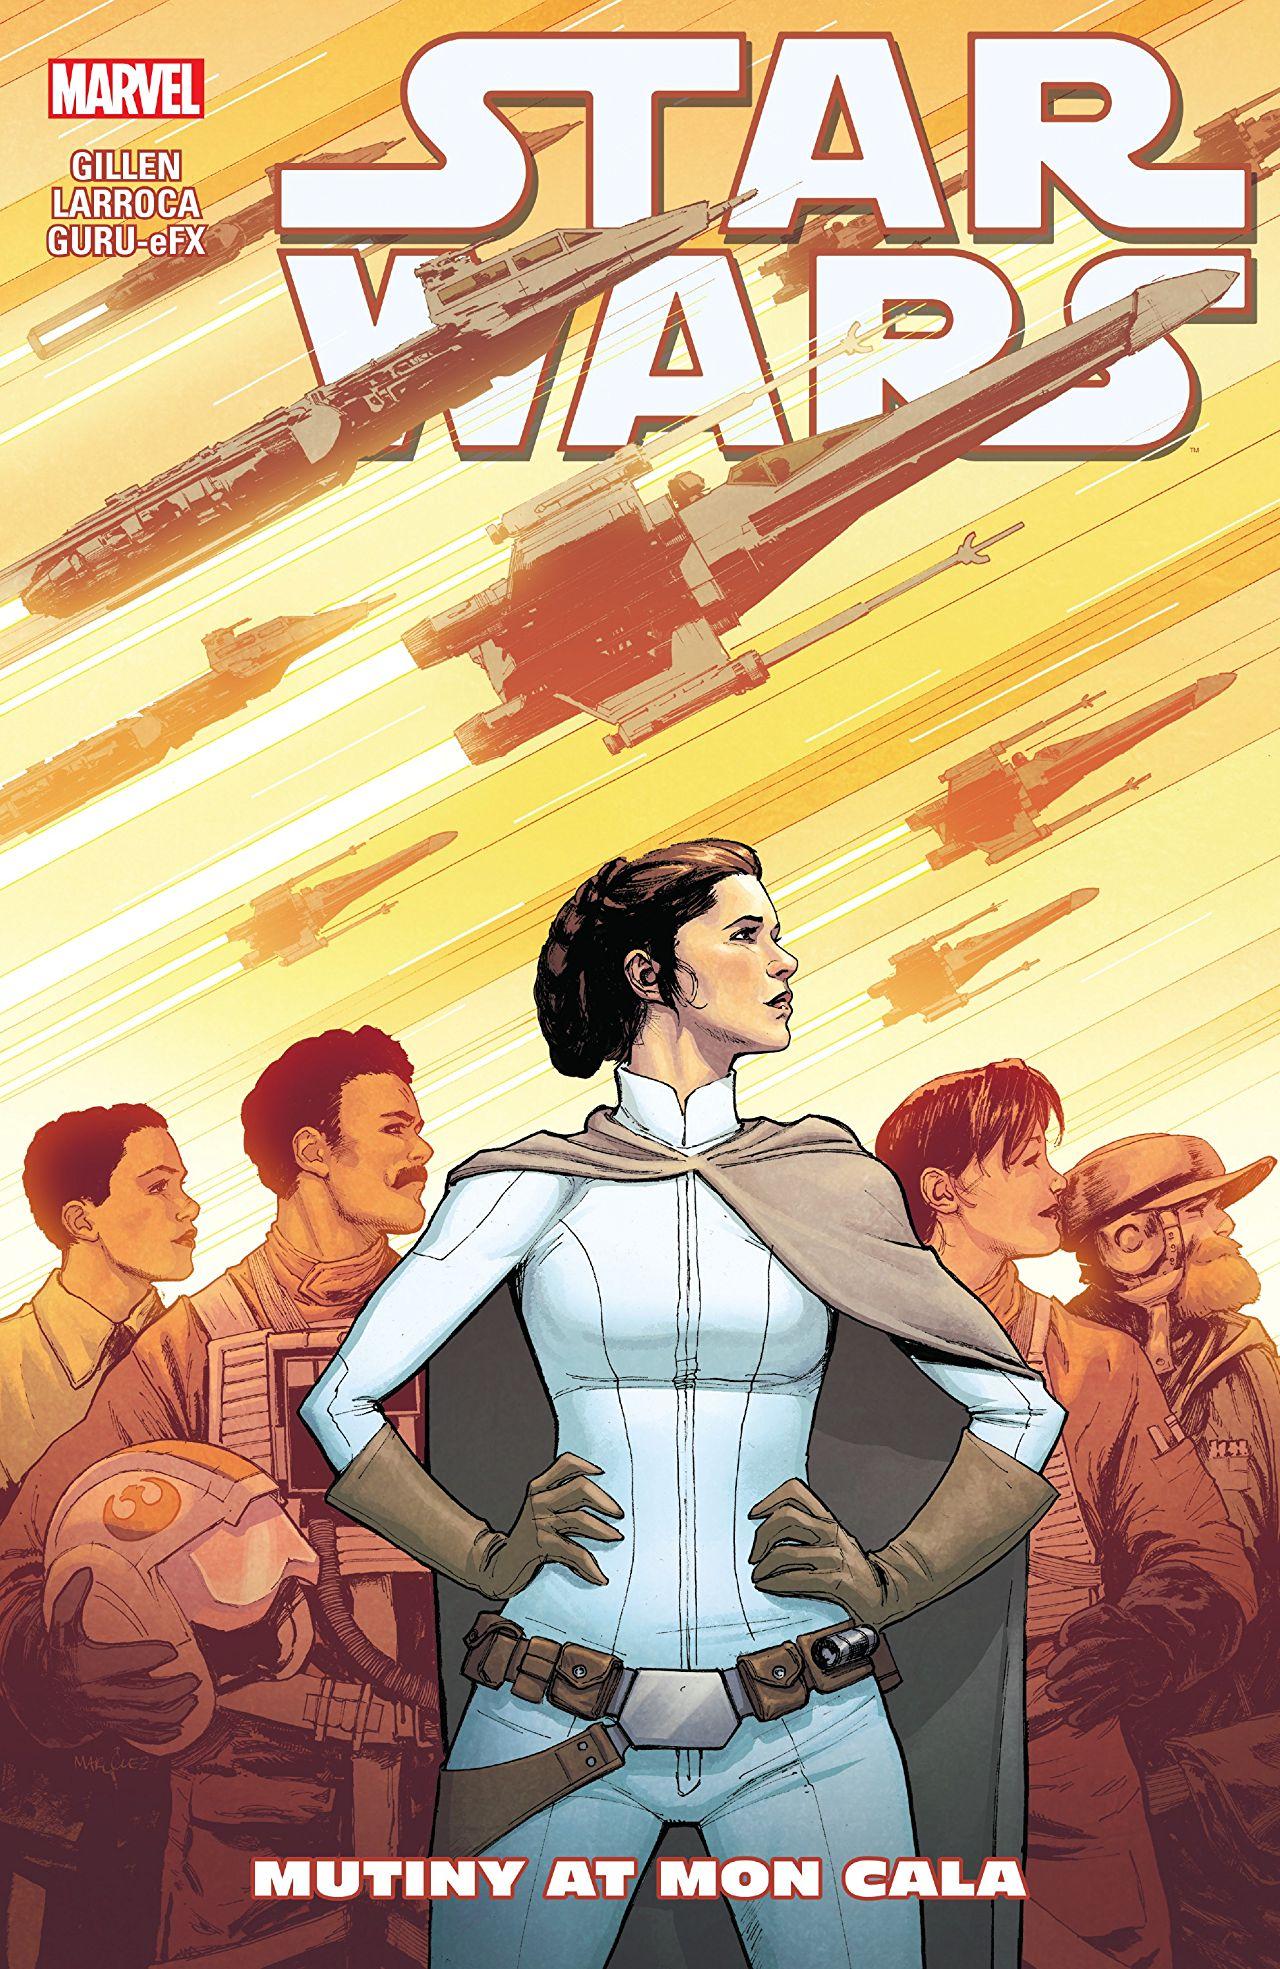 Звёздные войны: Выпуск 8 — Мятеж на Мон-Кале